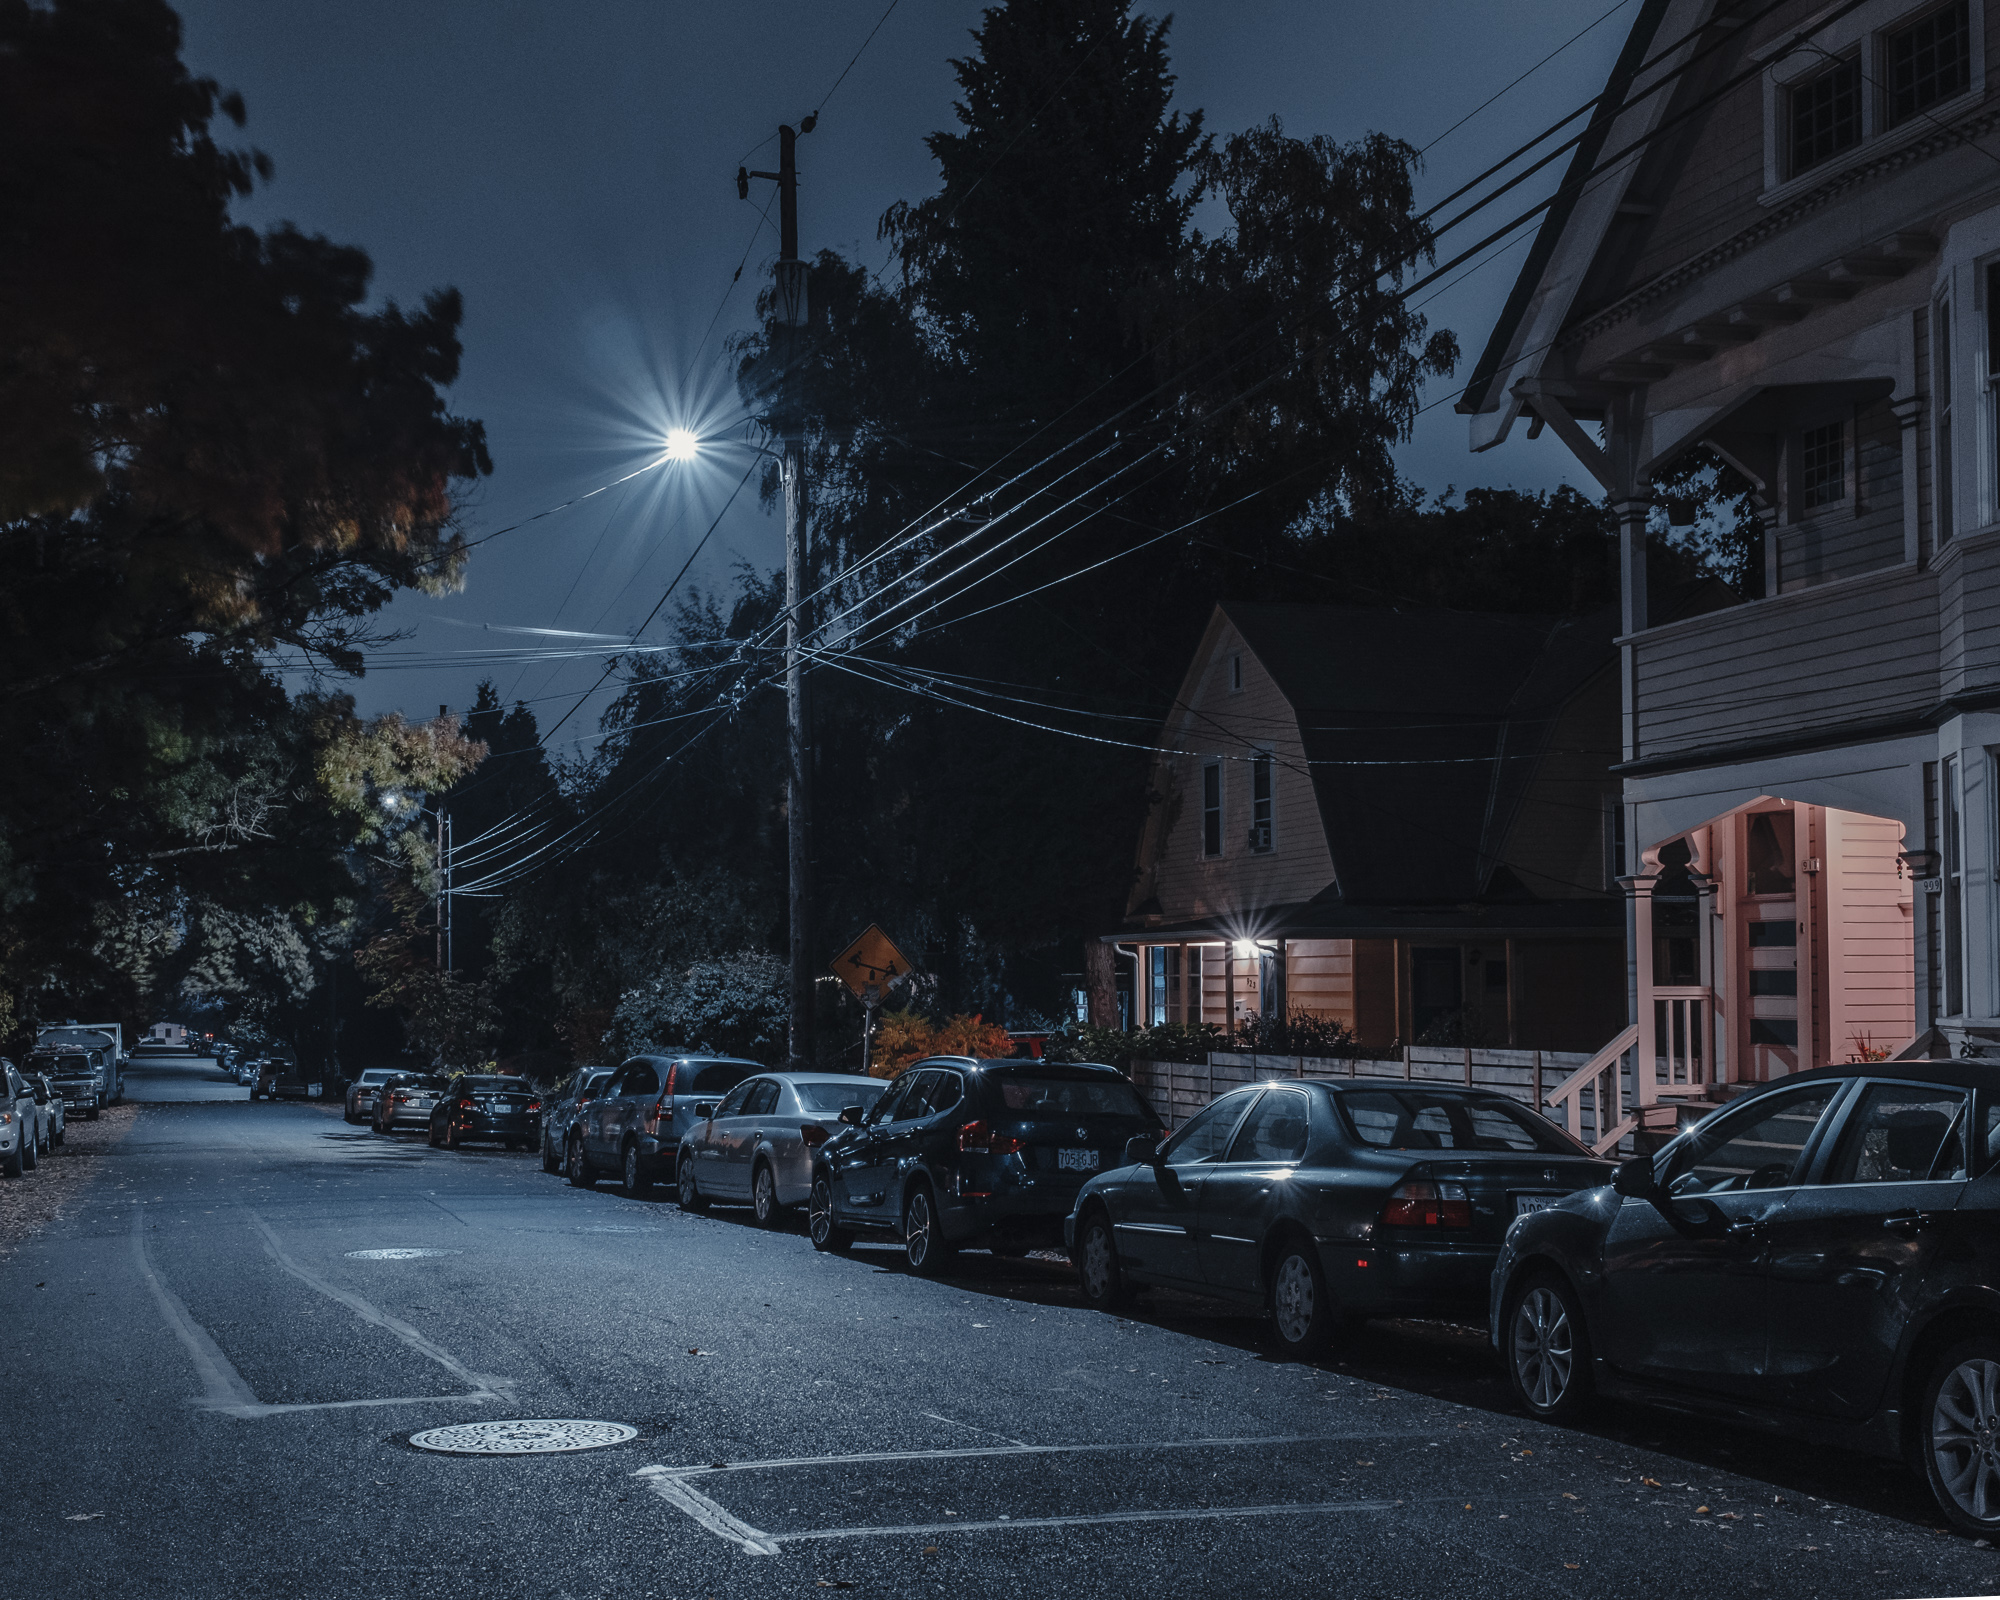 Nights-52.jpg